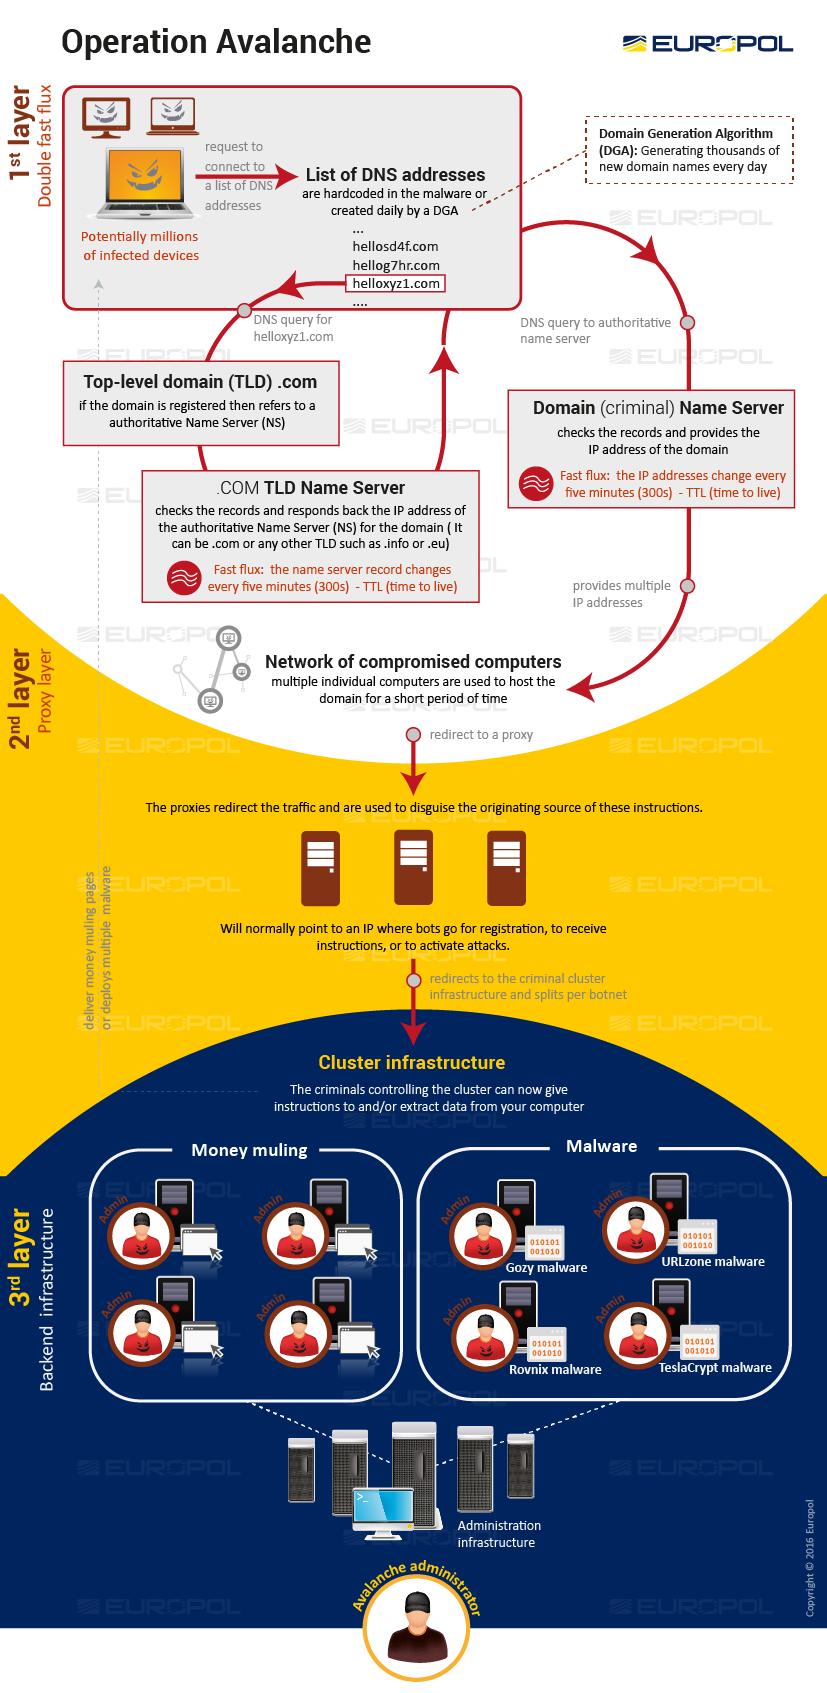 botnet-avalanche-atruktura-europol